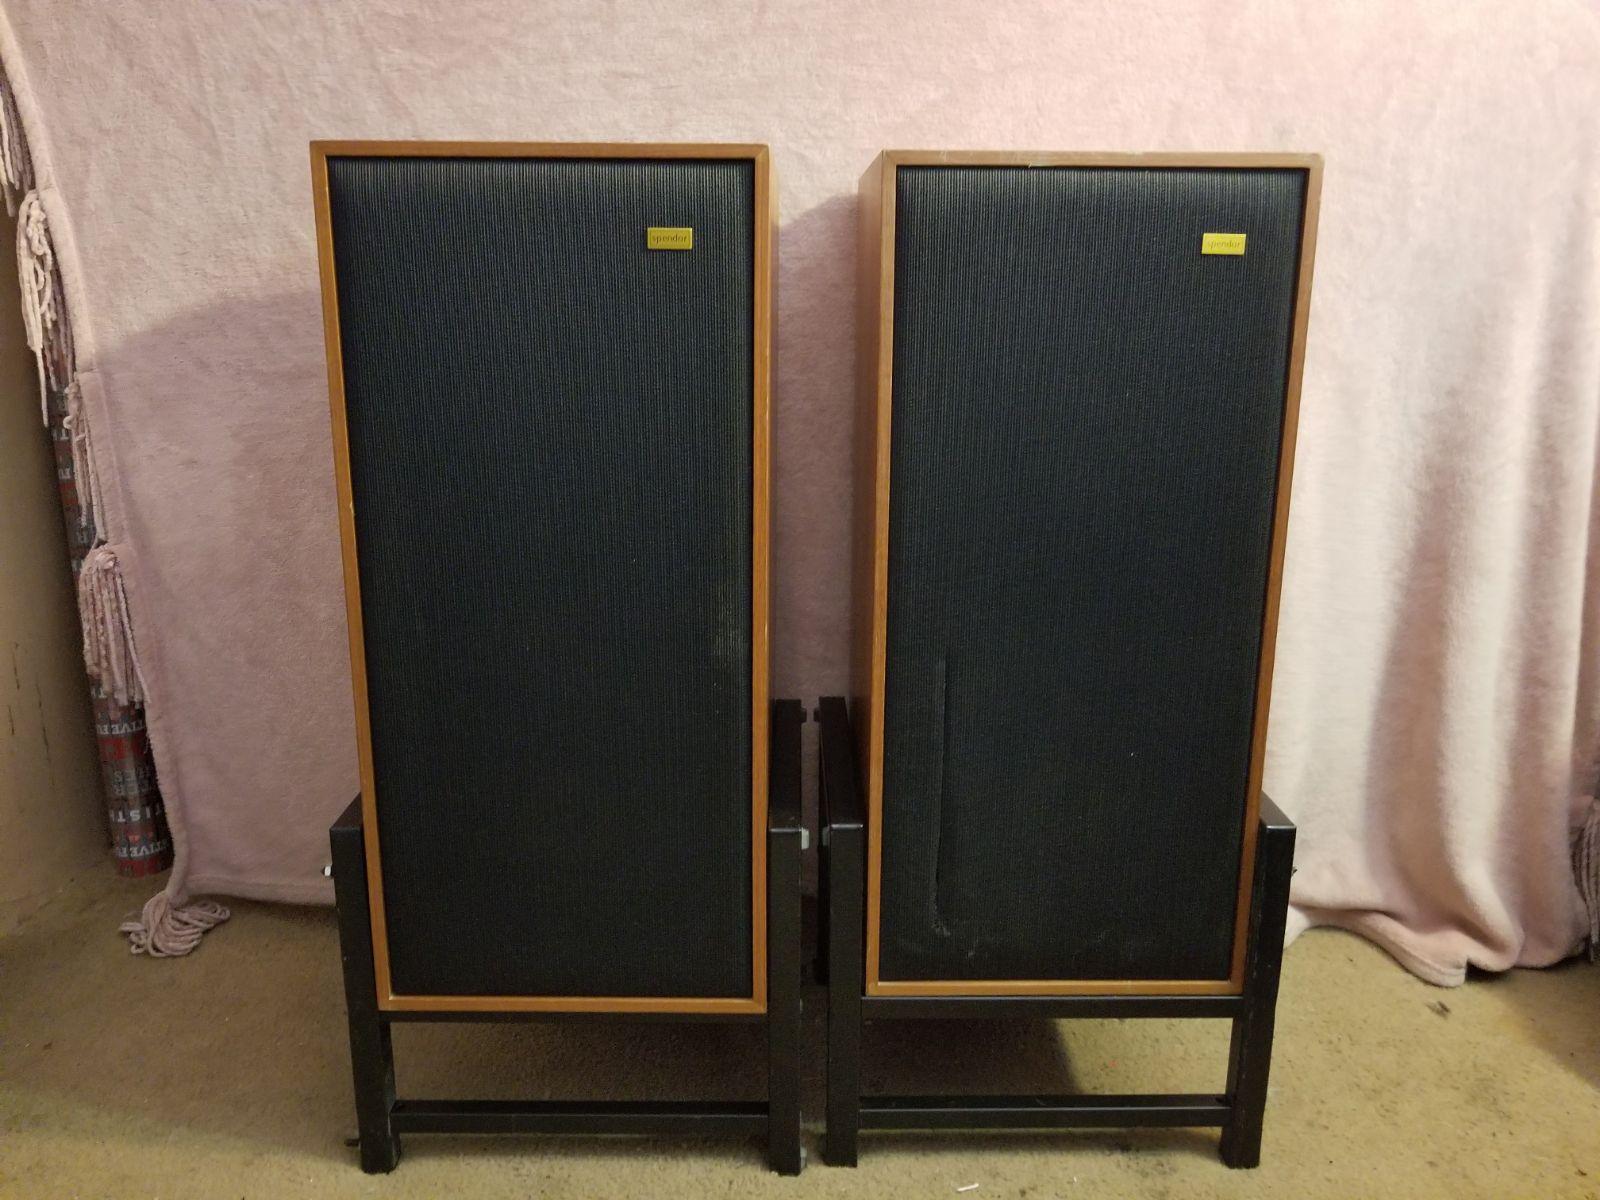 Spendor Vintige 1970 type: BCI speakers